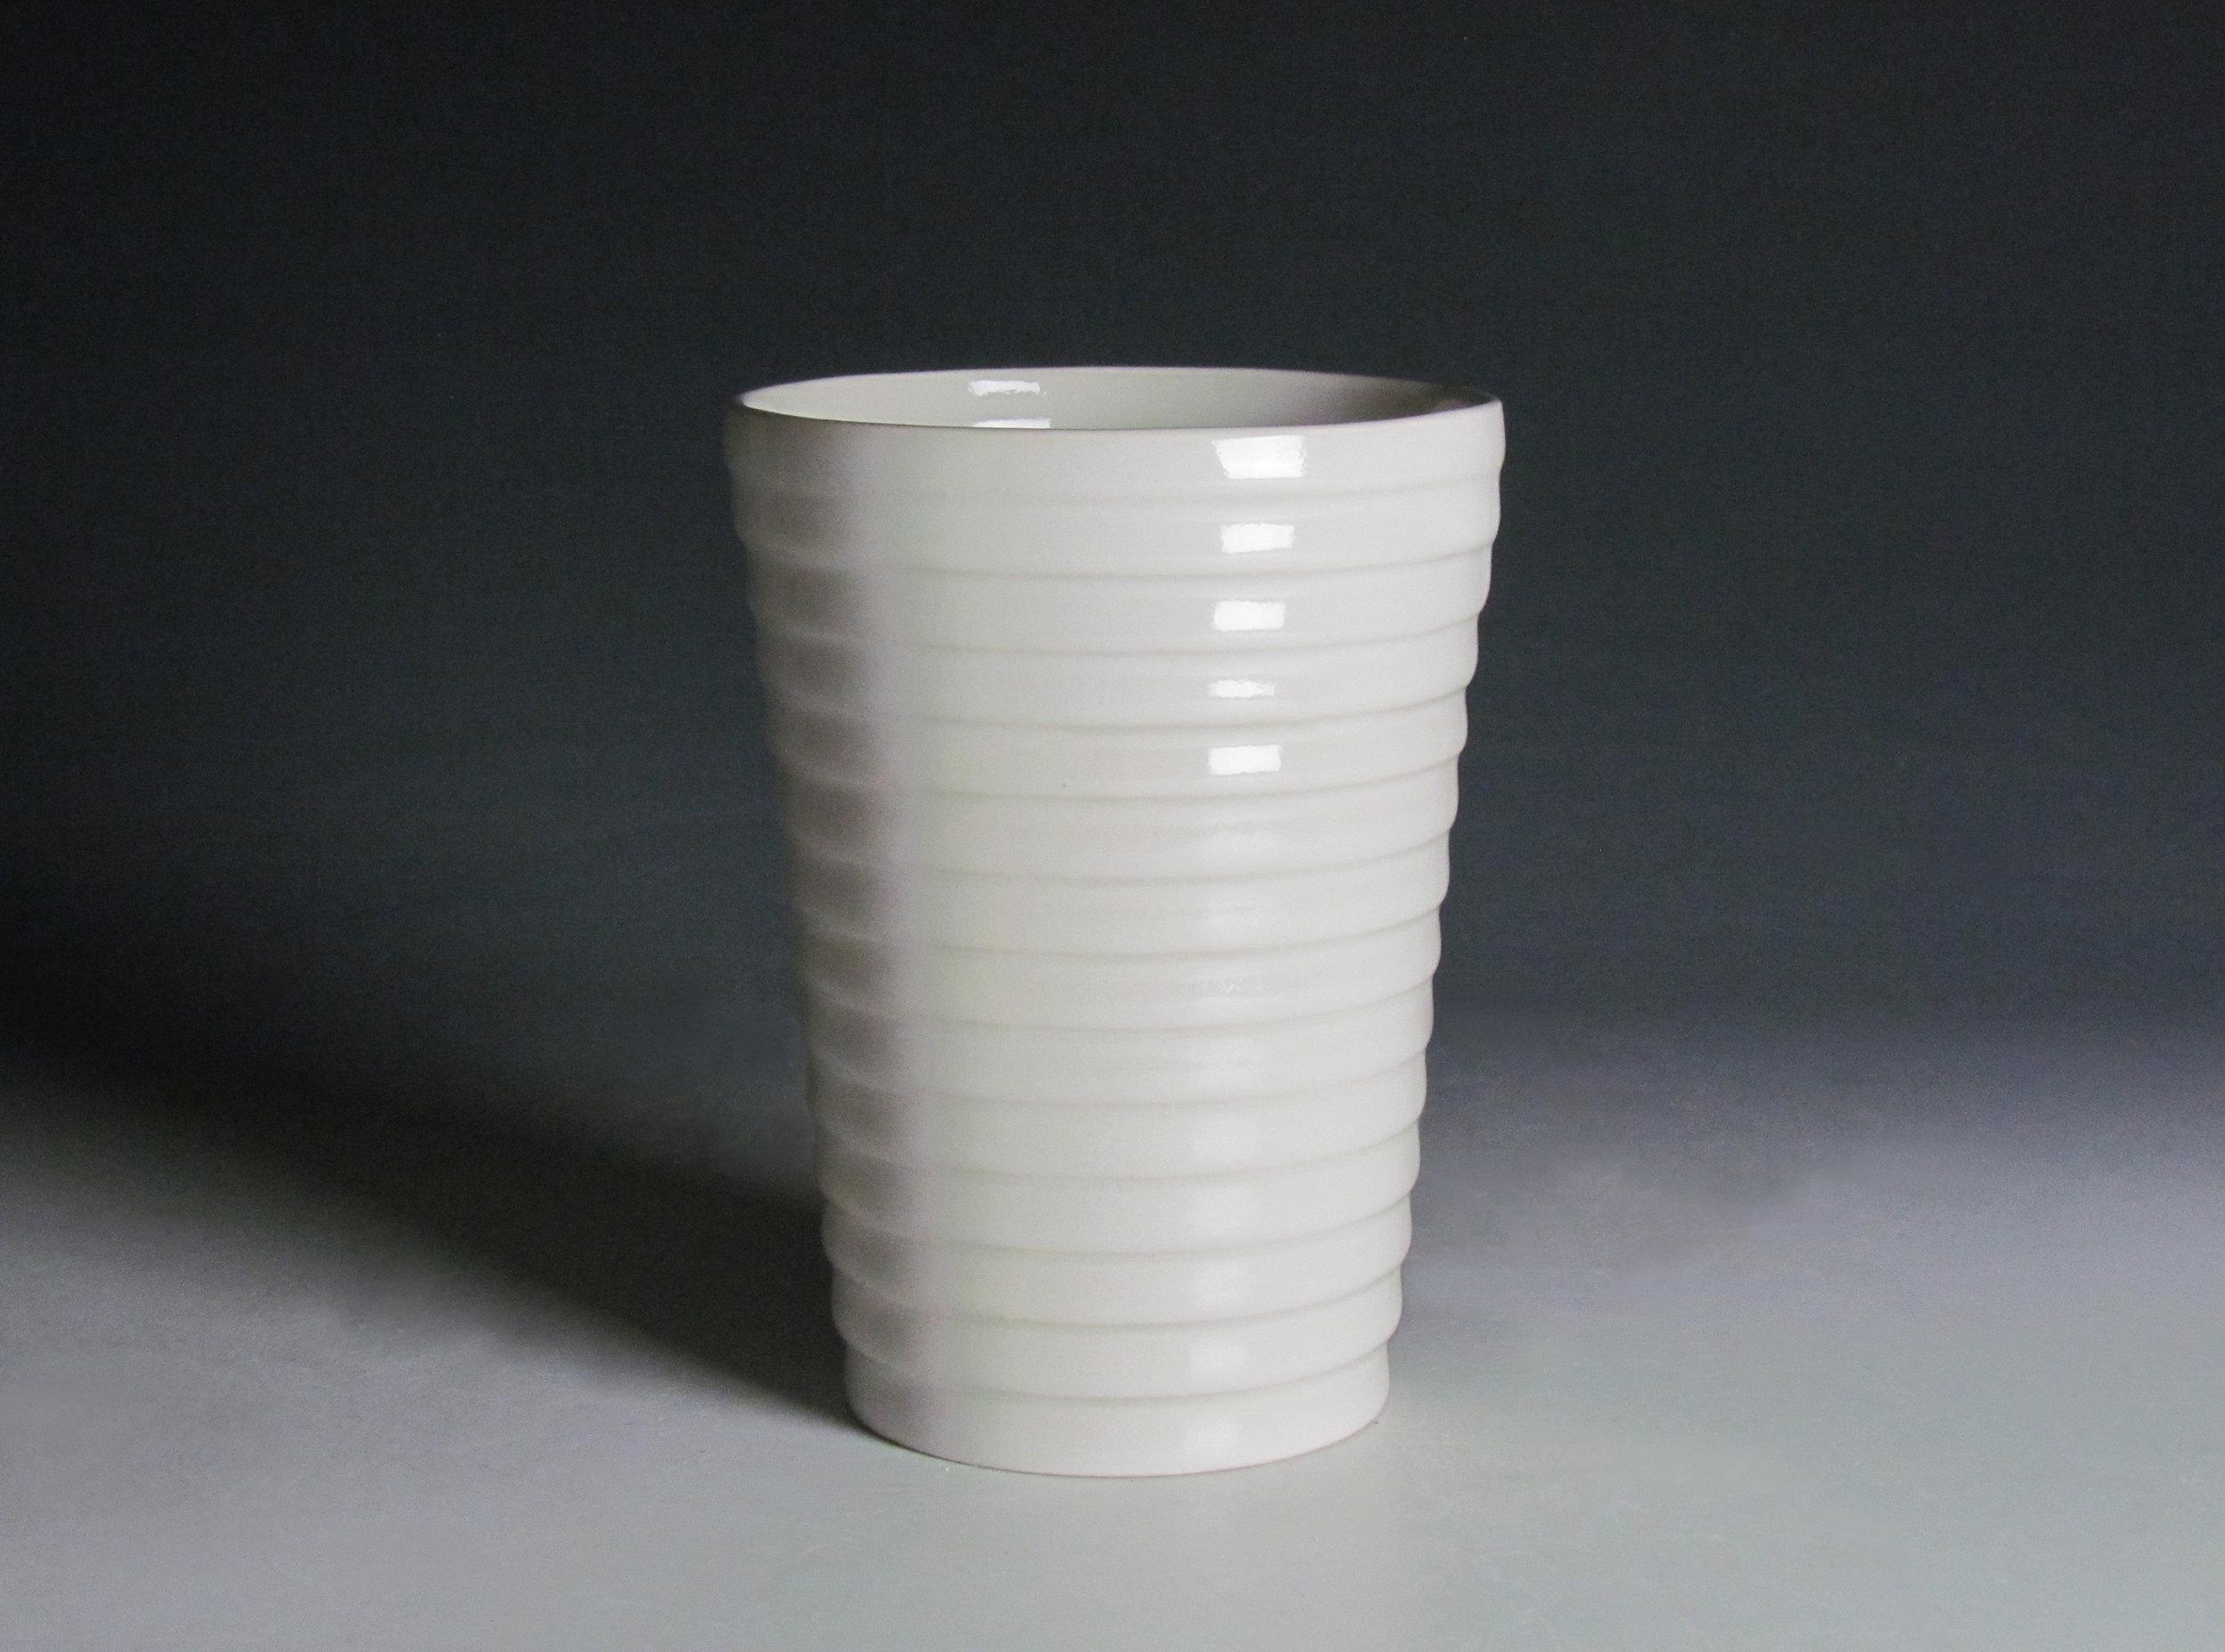 Tumbler (White)  |  7 x 3 x 3 inches  |  Porcelain, Glaze  |  2016